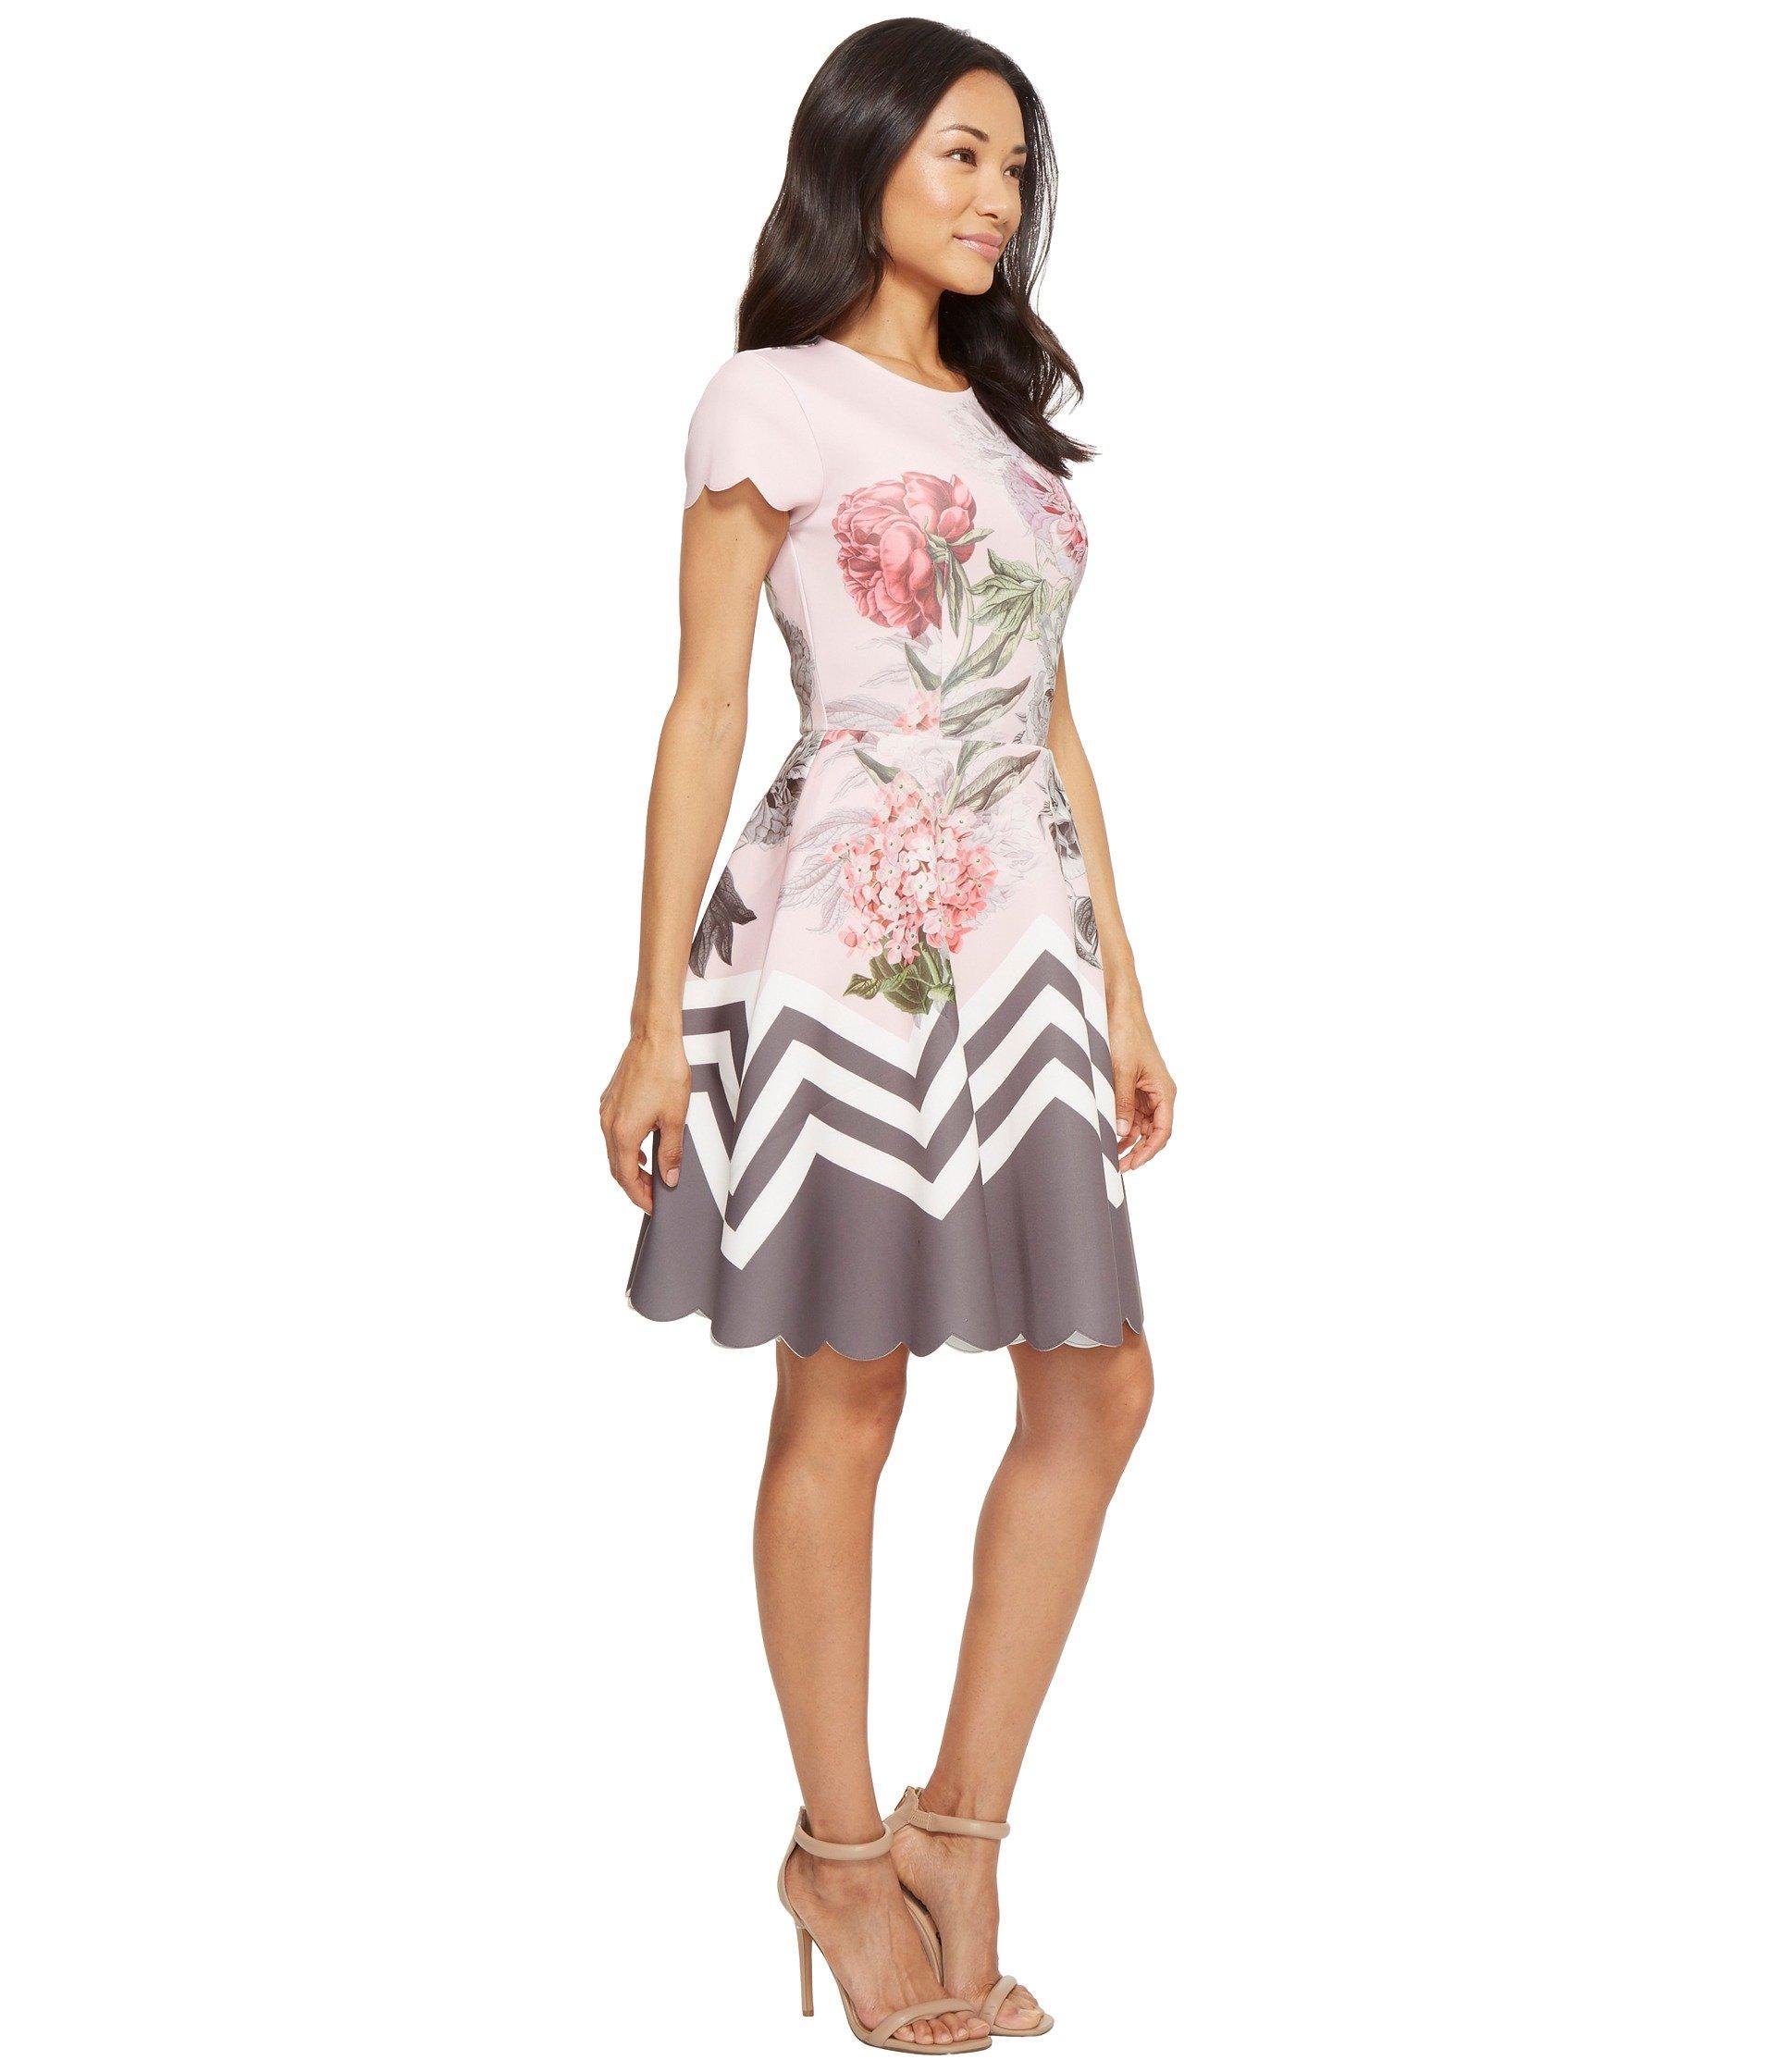 e51e8ffbc Lyst - Ted Baker Haiilie Palace Gardens Ruffle Skater Dress in Pink